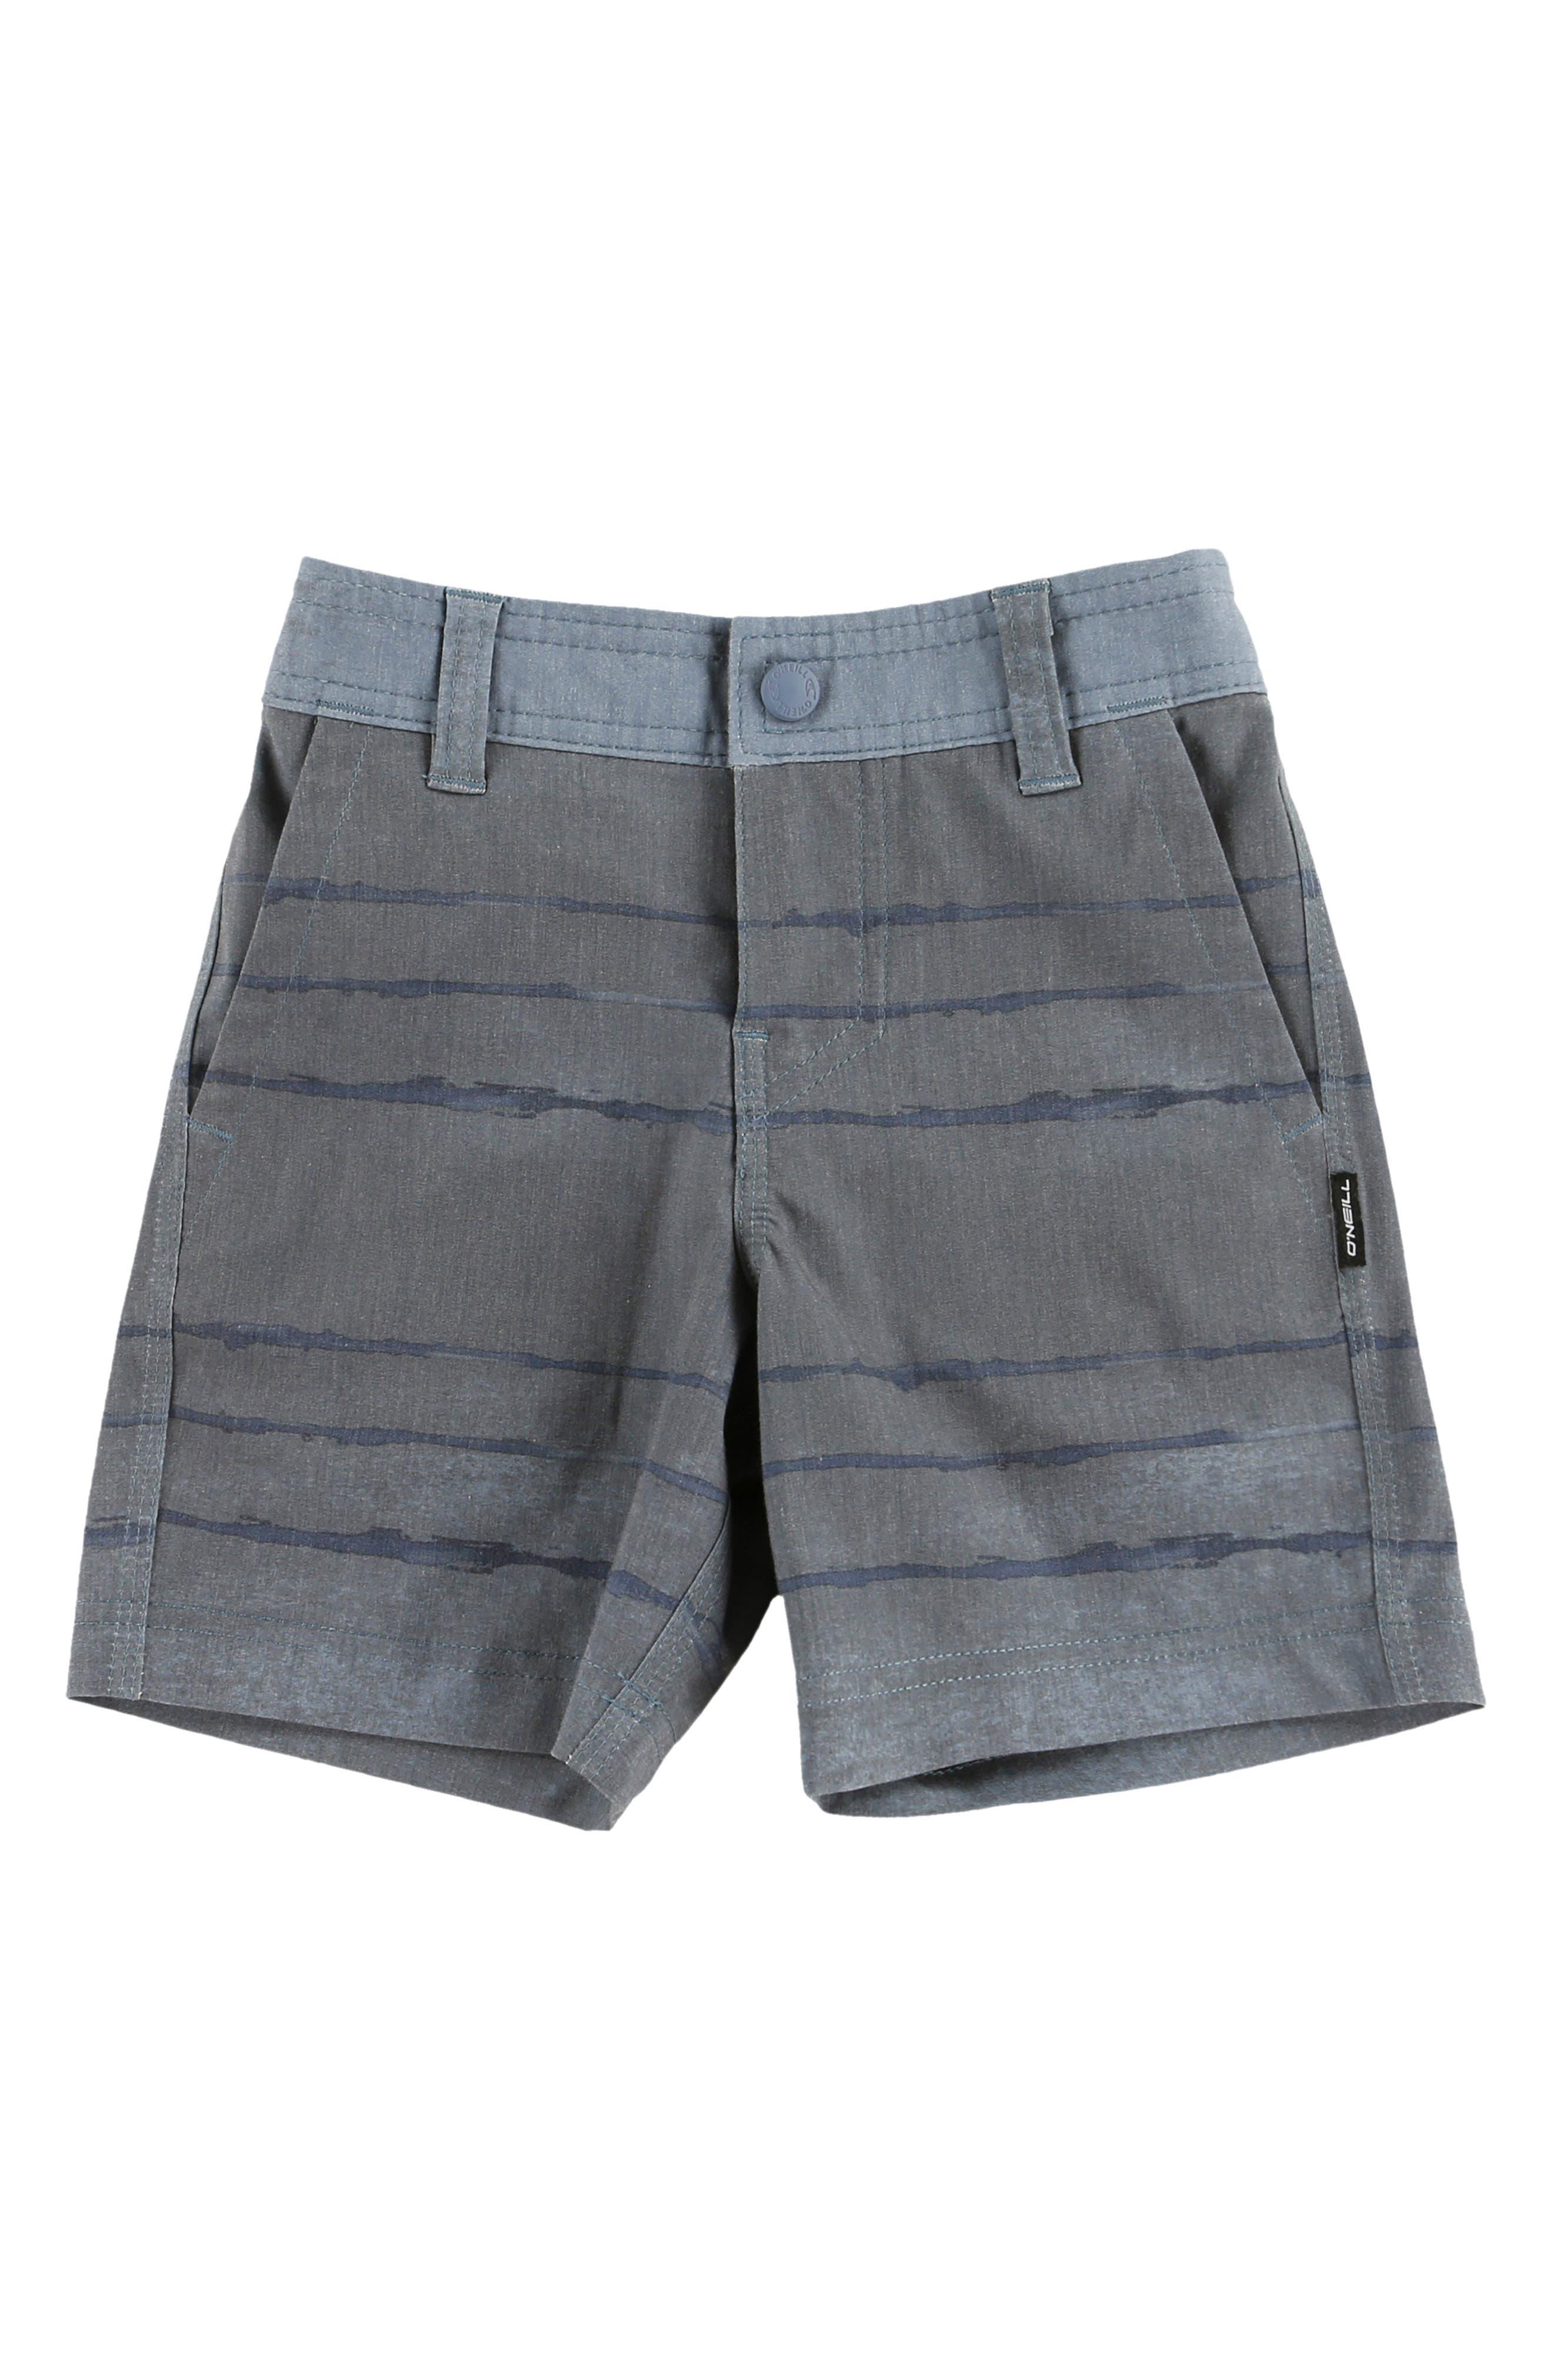 Tye Striper Hybrid Shorts,                             Main thumbnail 1, color,                             DUST BLUE